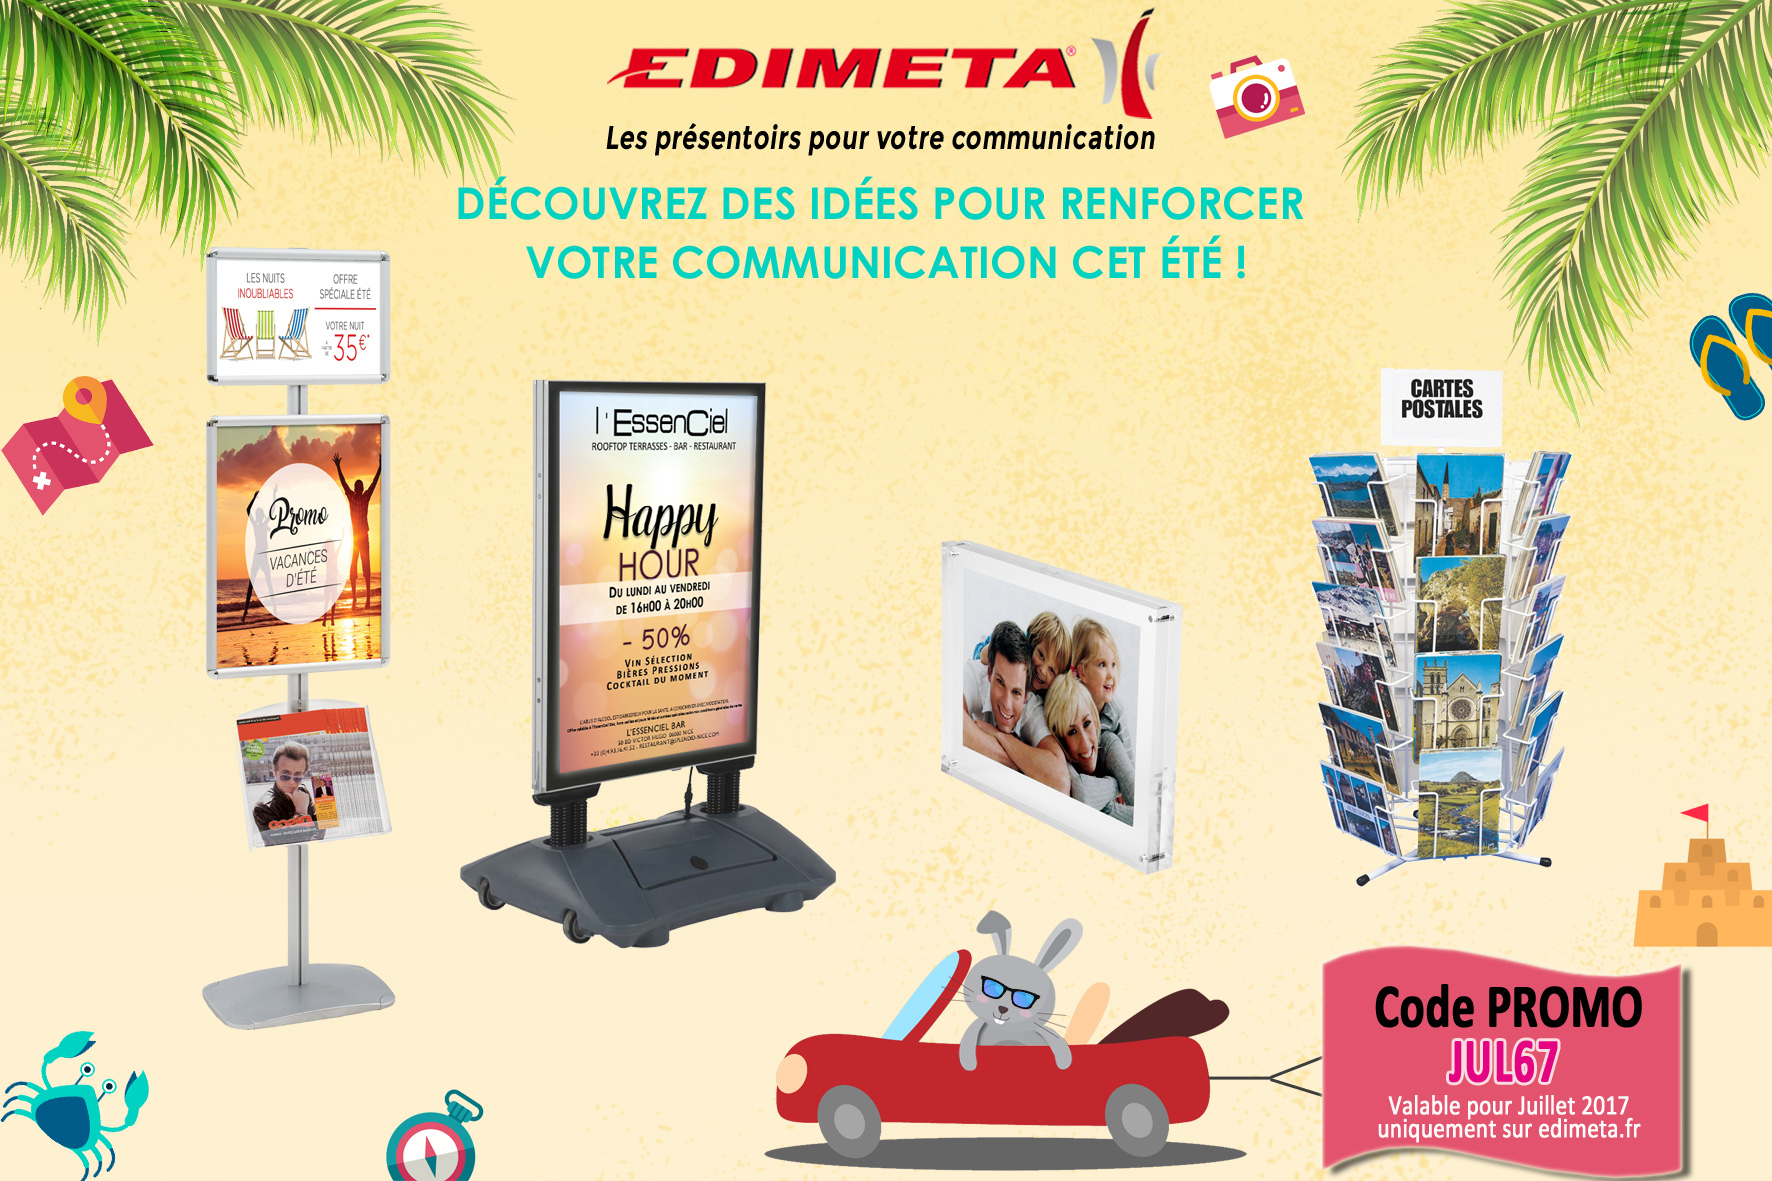 EDIMETA - Code promo pour Juillet 2017